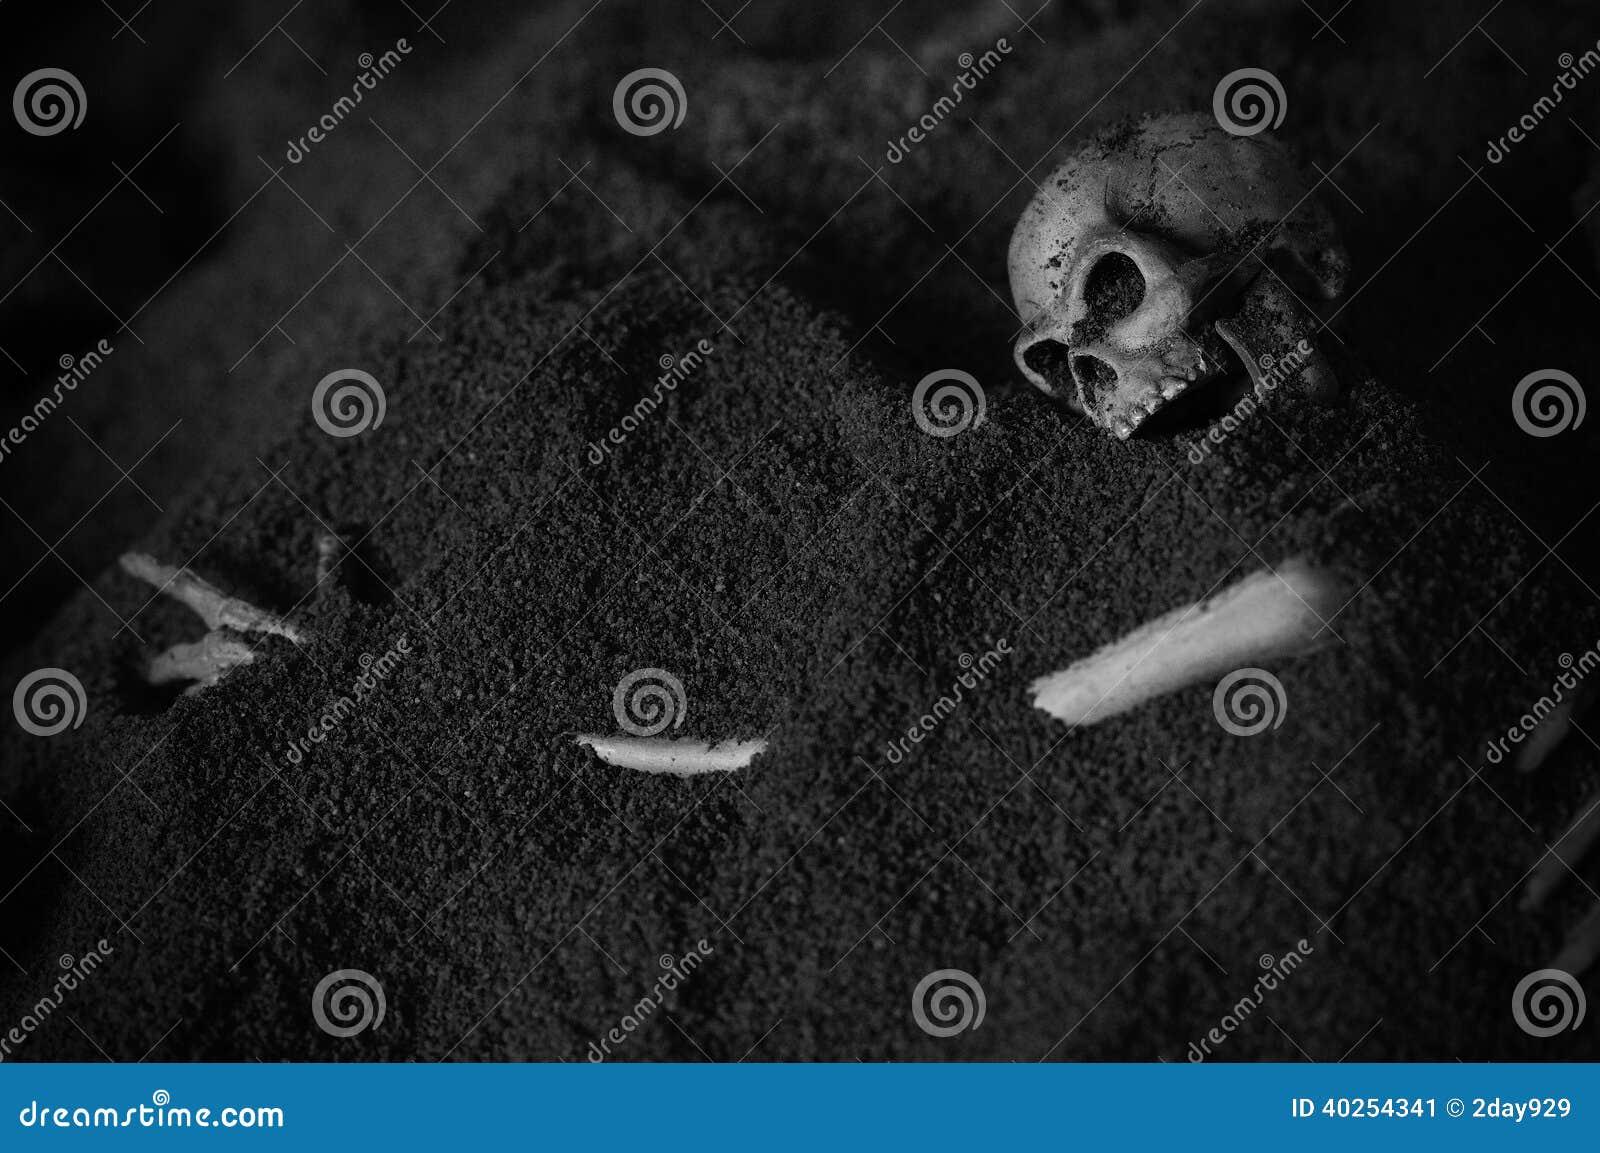 Human Skeleton - Black and white